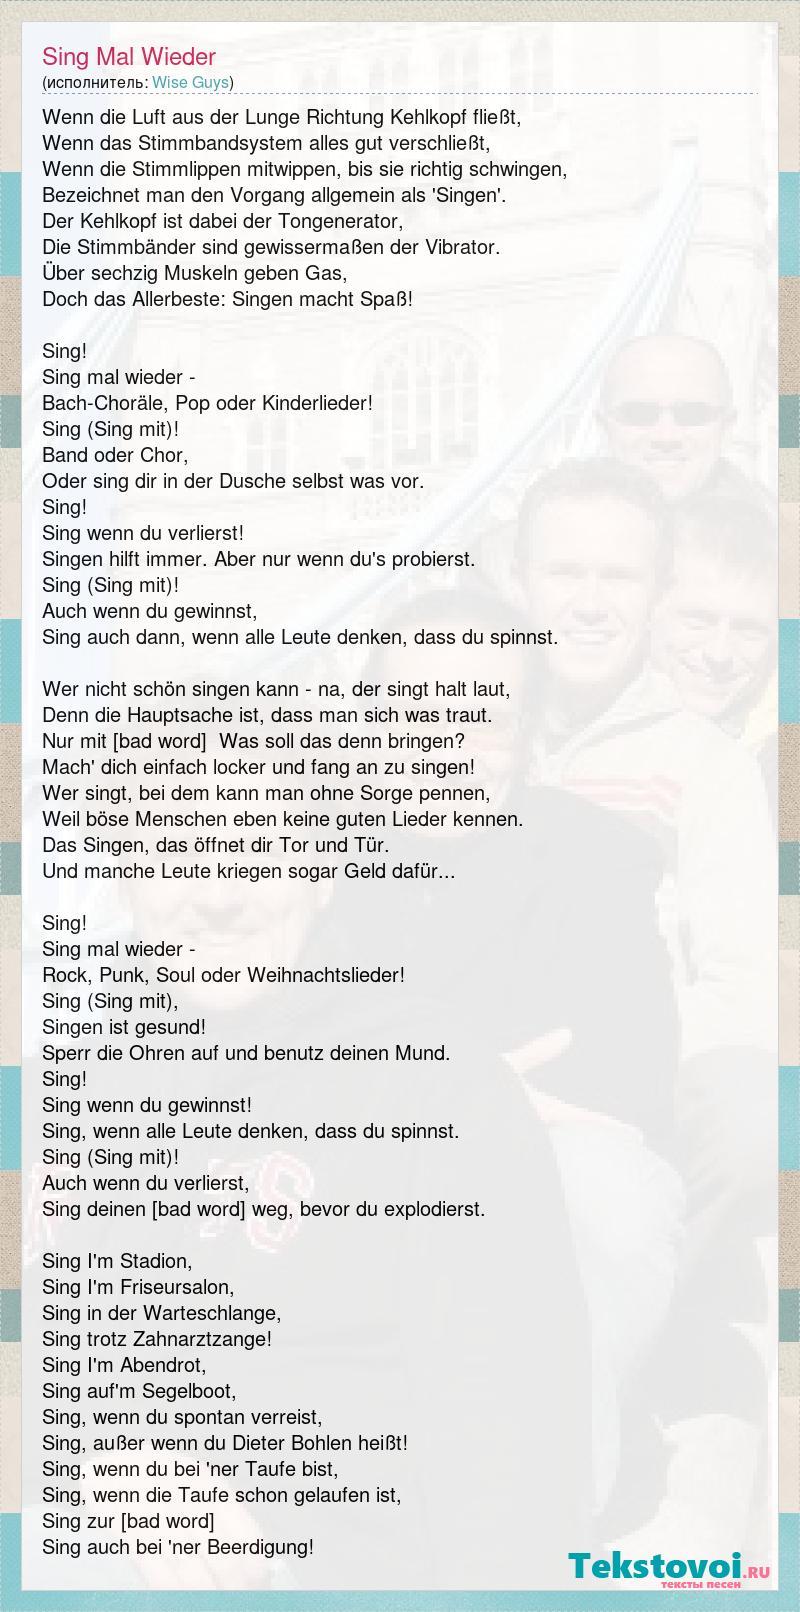 Wise Guys Sing Mal Wieder слова песни